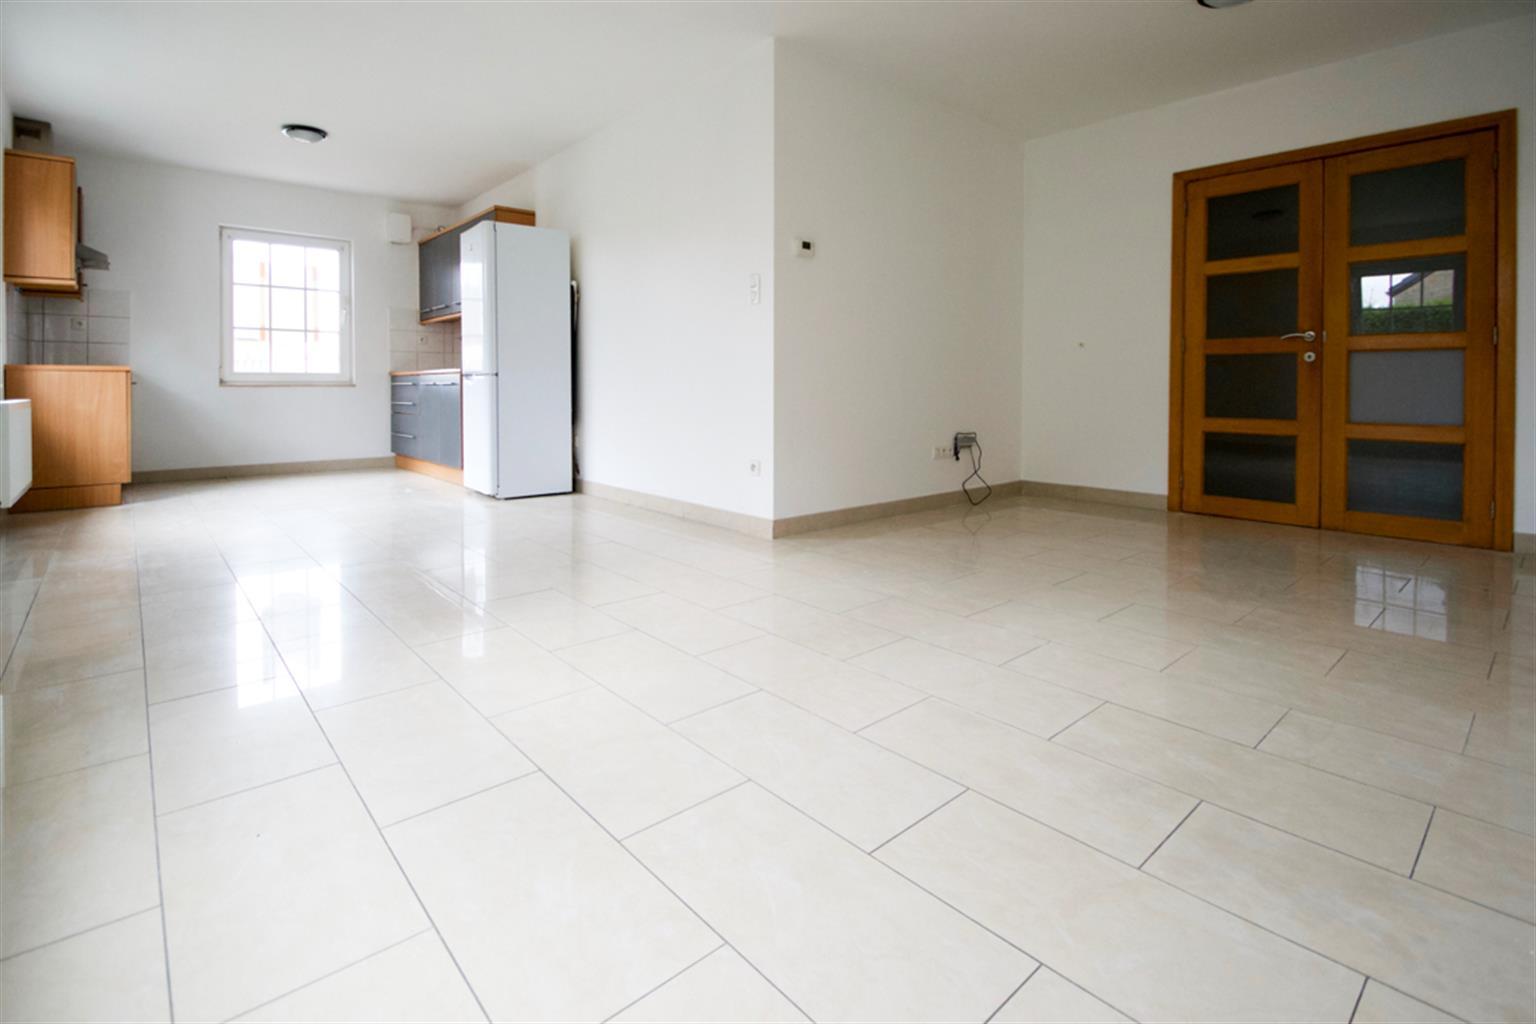 Appartement - Binche Leval-Trahegnies - #4172288-1